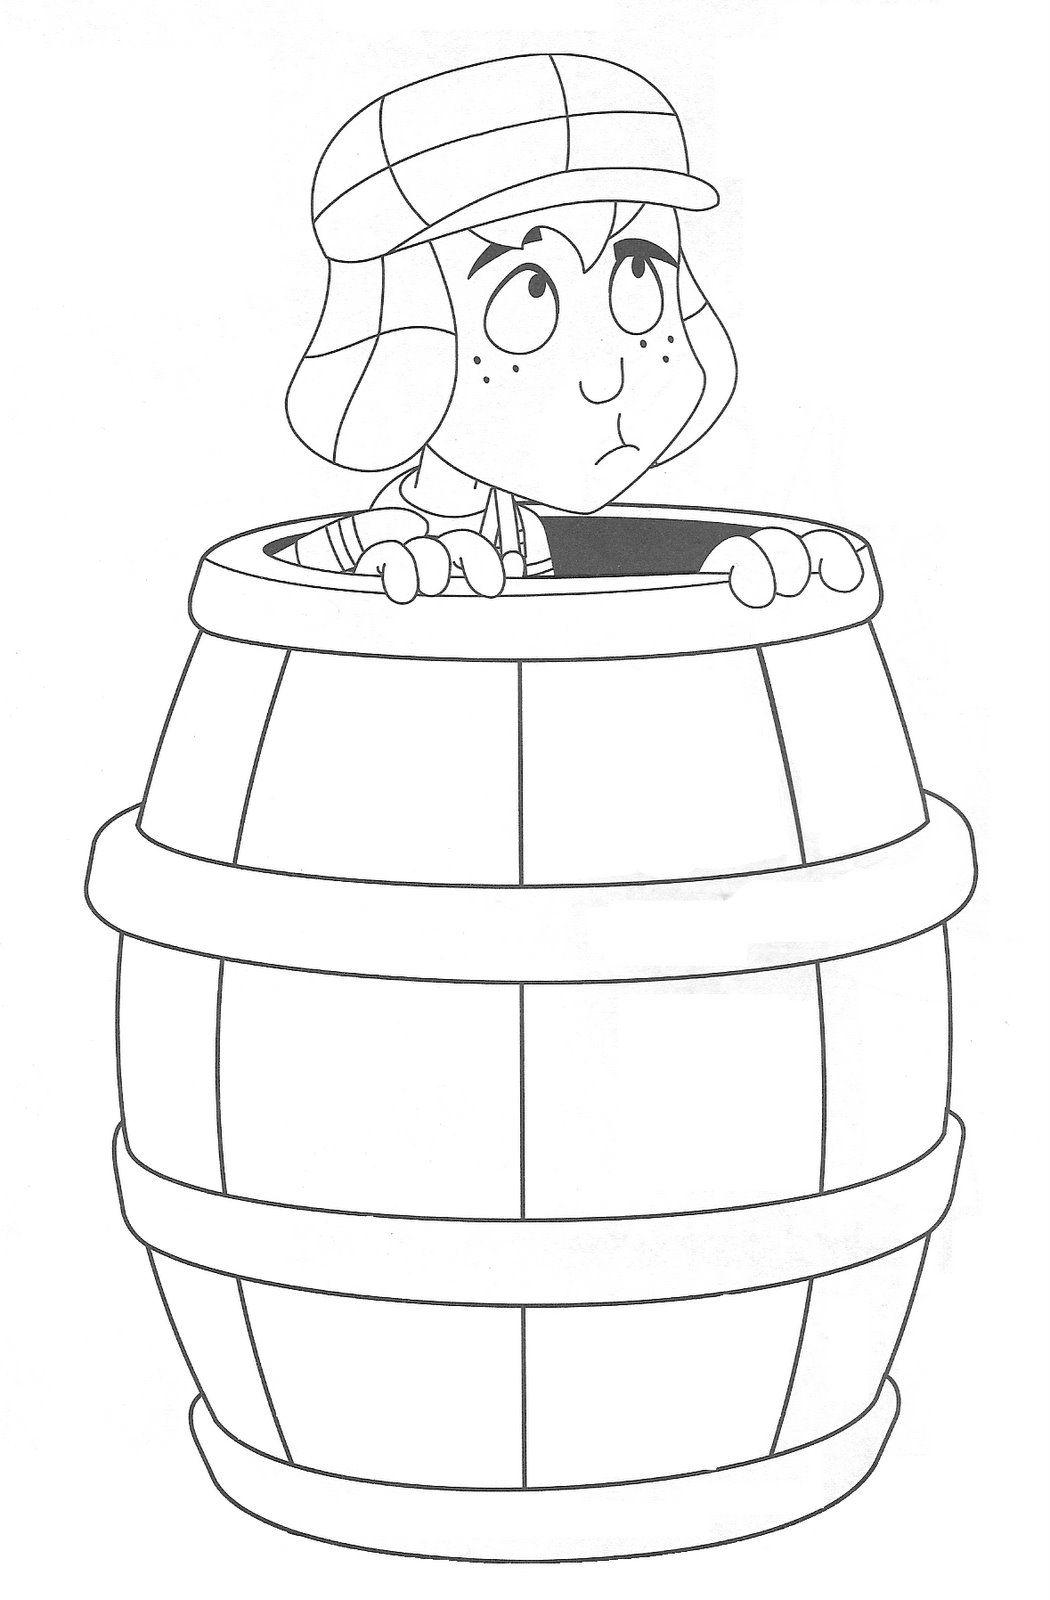 El Chavo Animado Para Colorear Dibujos Chavo 09